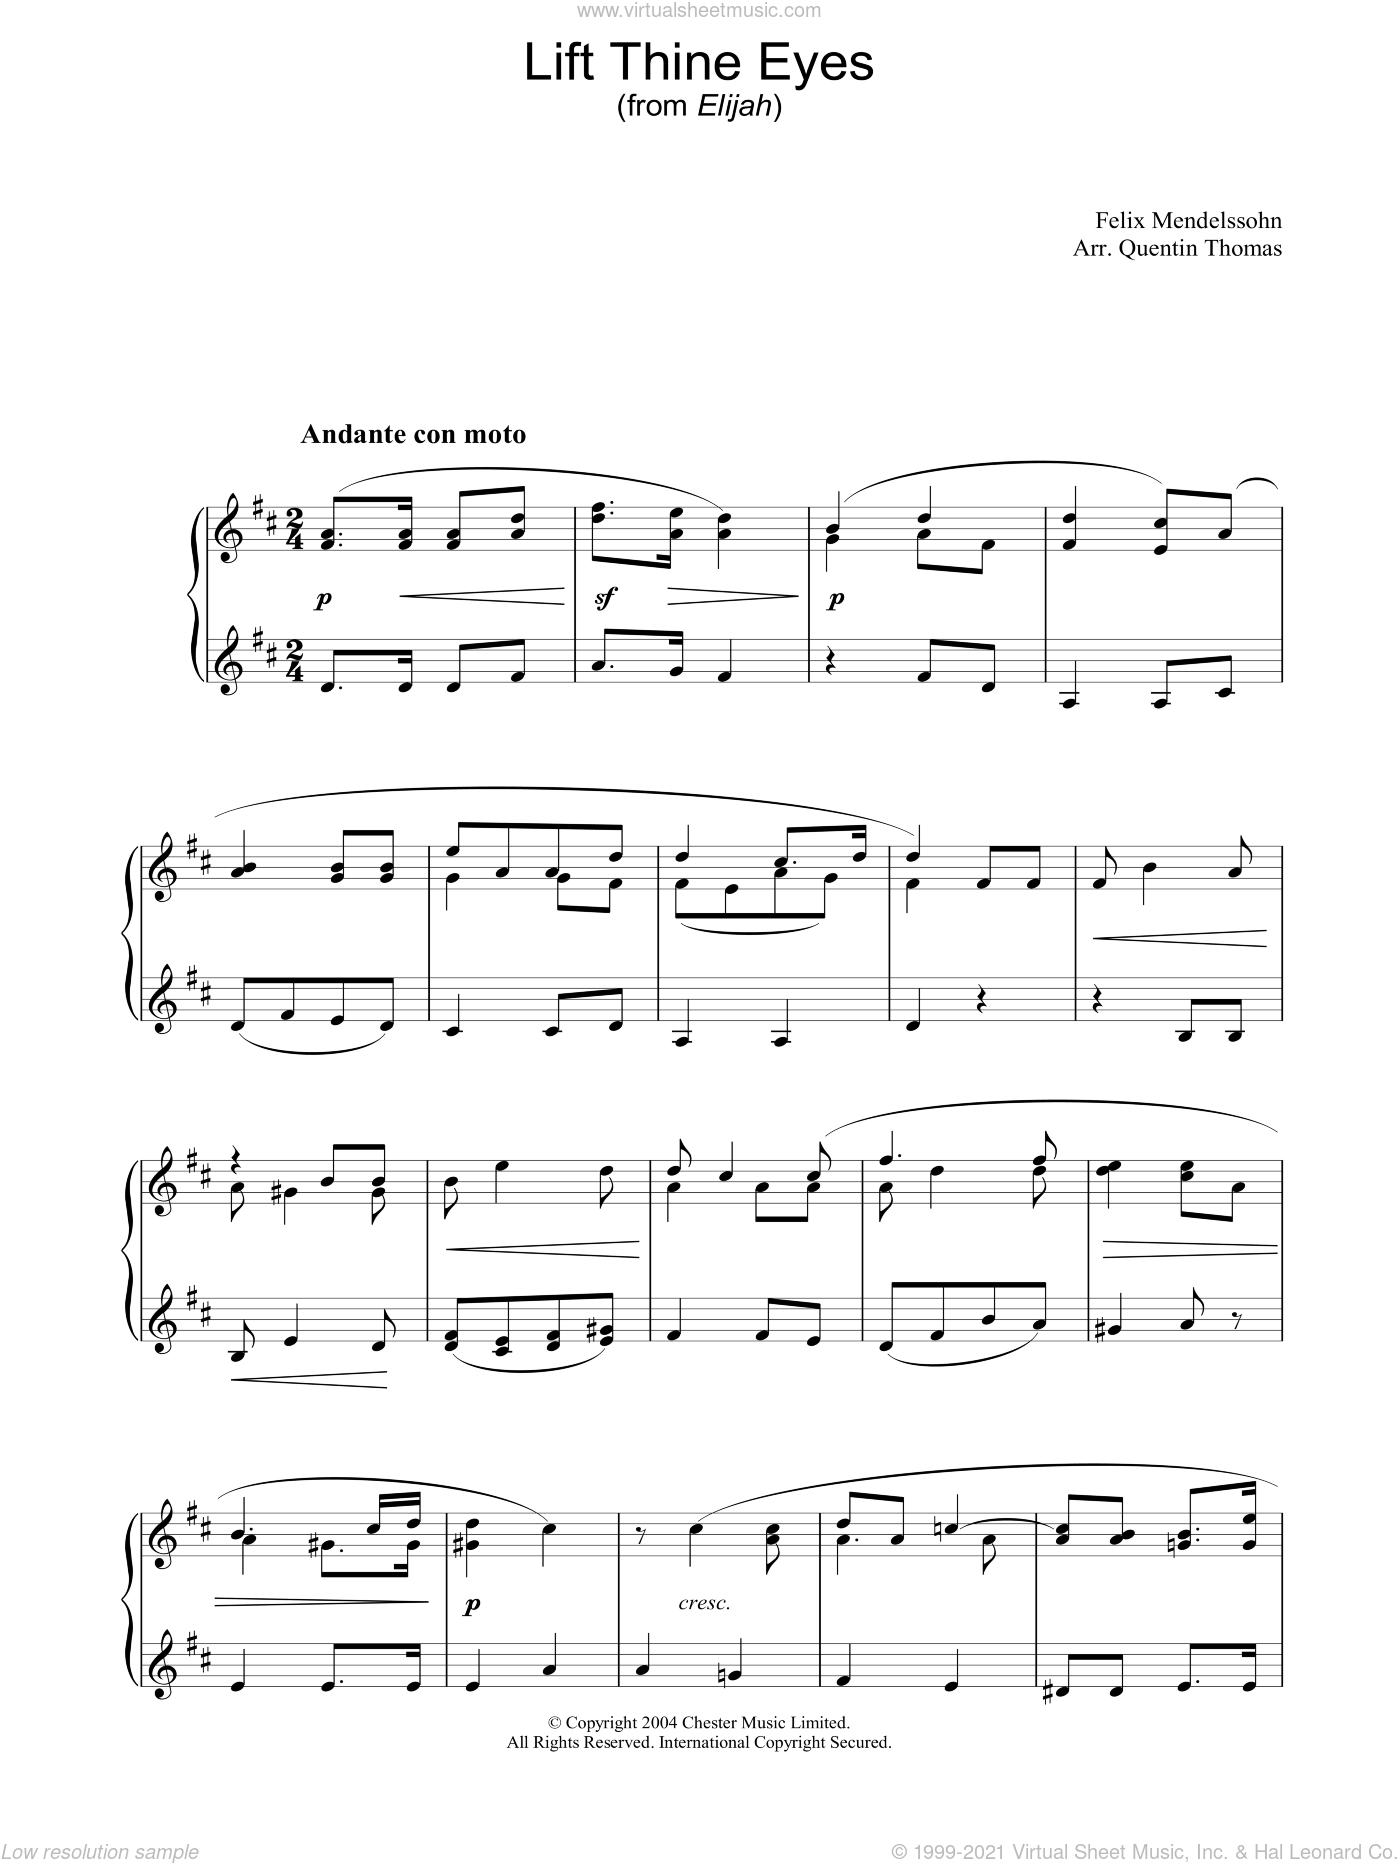 Lift Thine Eyes sheet music for piano solo by Felix Mendelssohn-Bartholdy, classical score, intermediate skill level